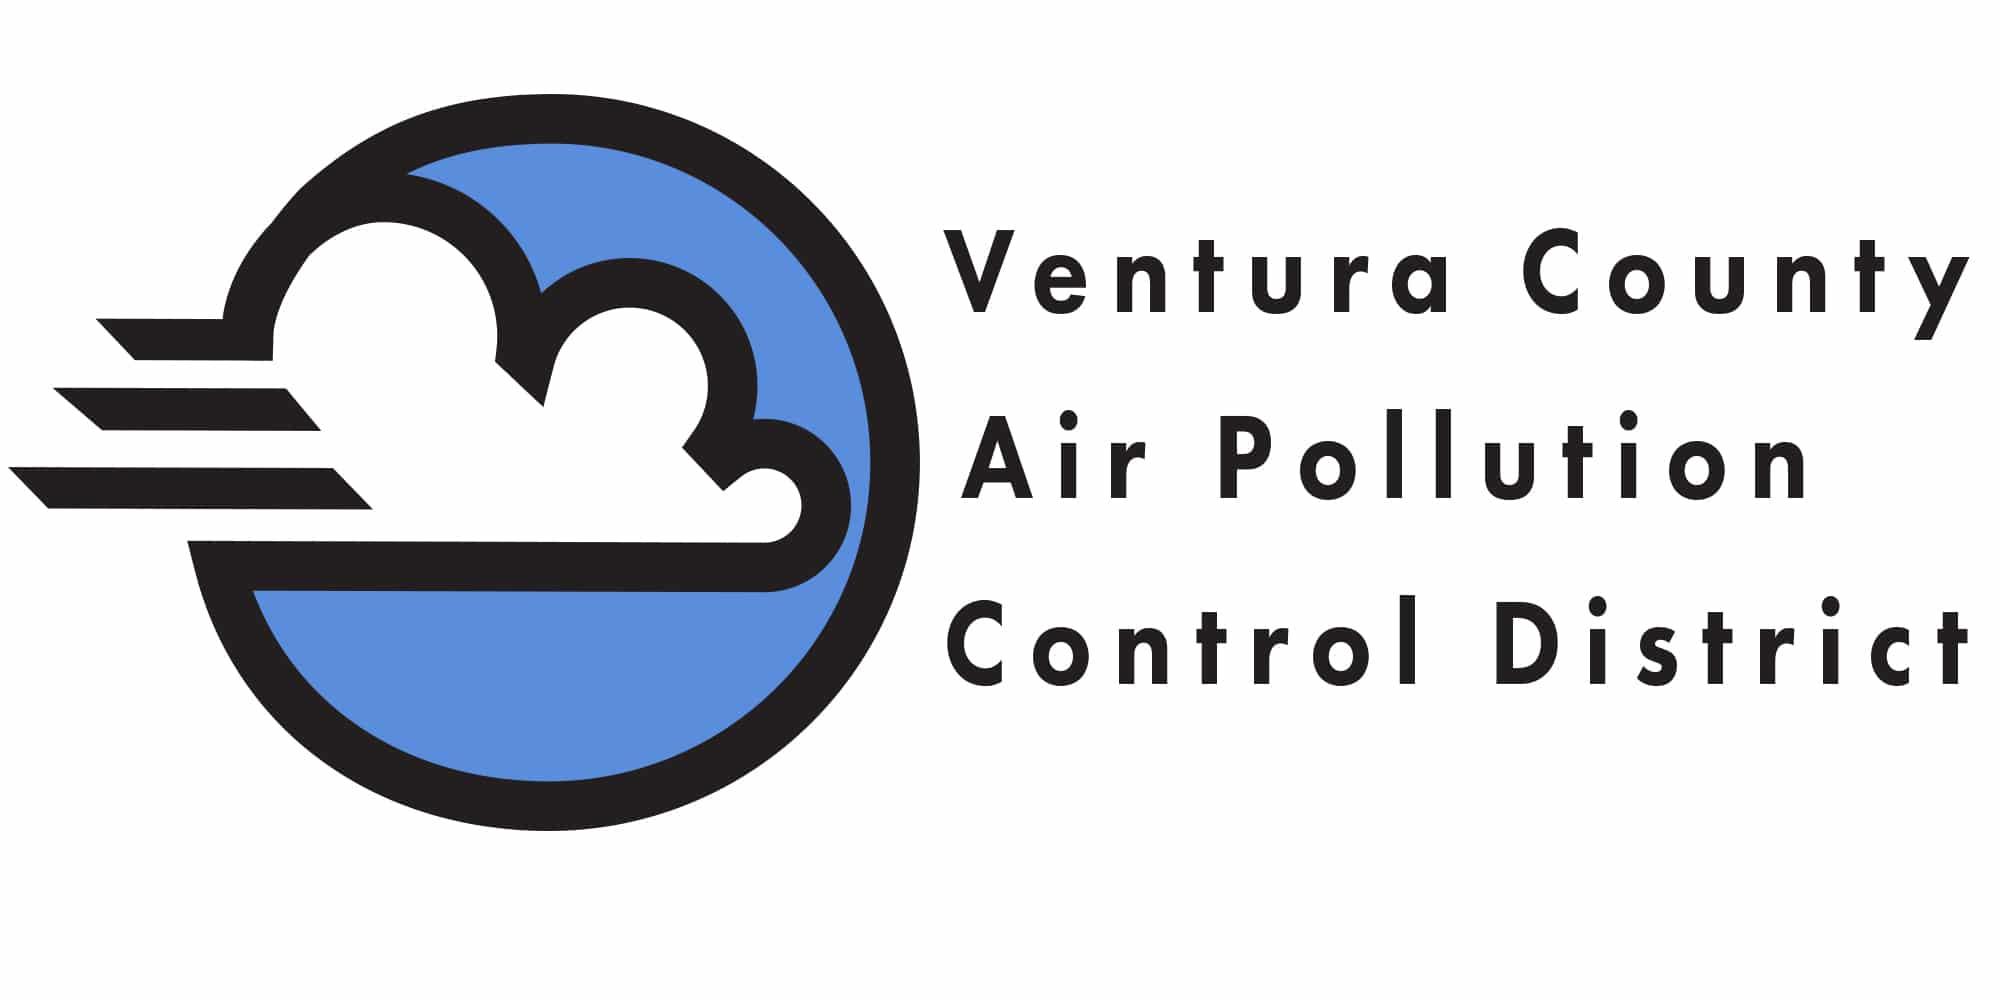 Ventura County Air Pollution Control District